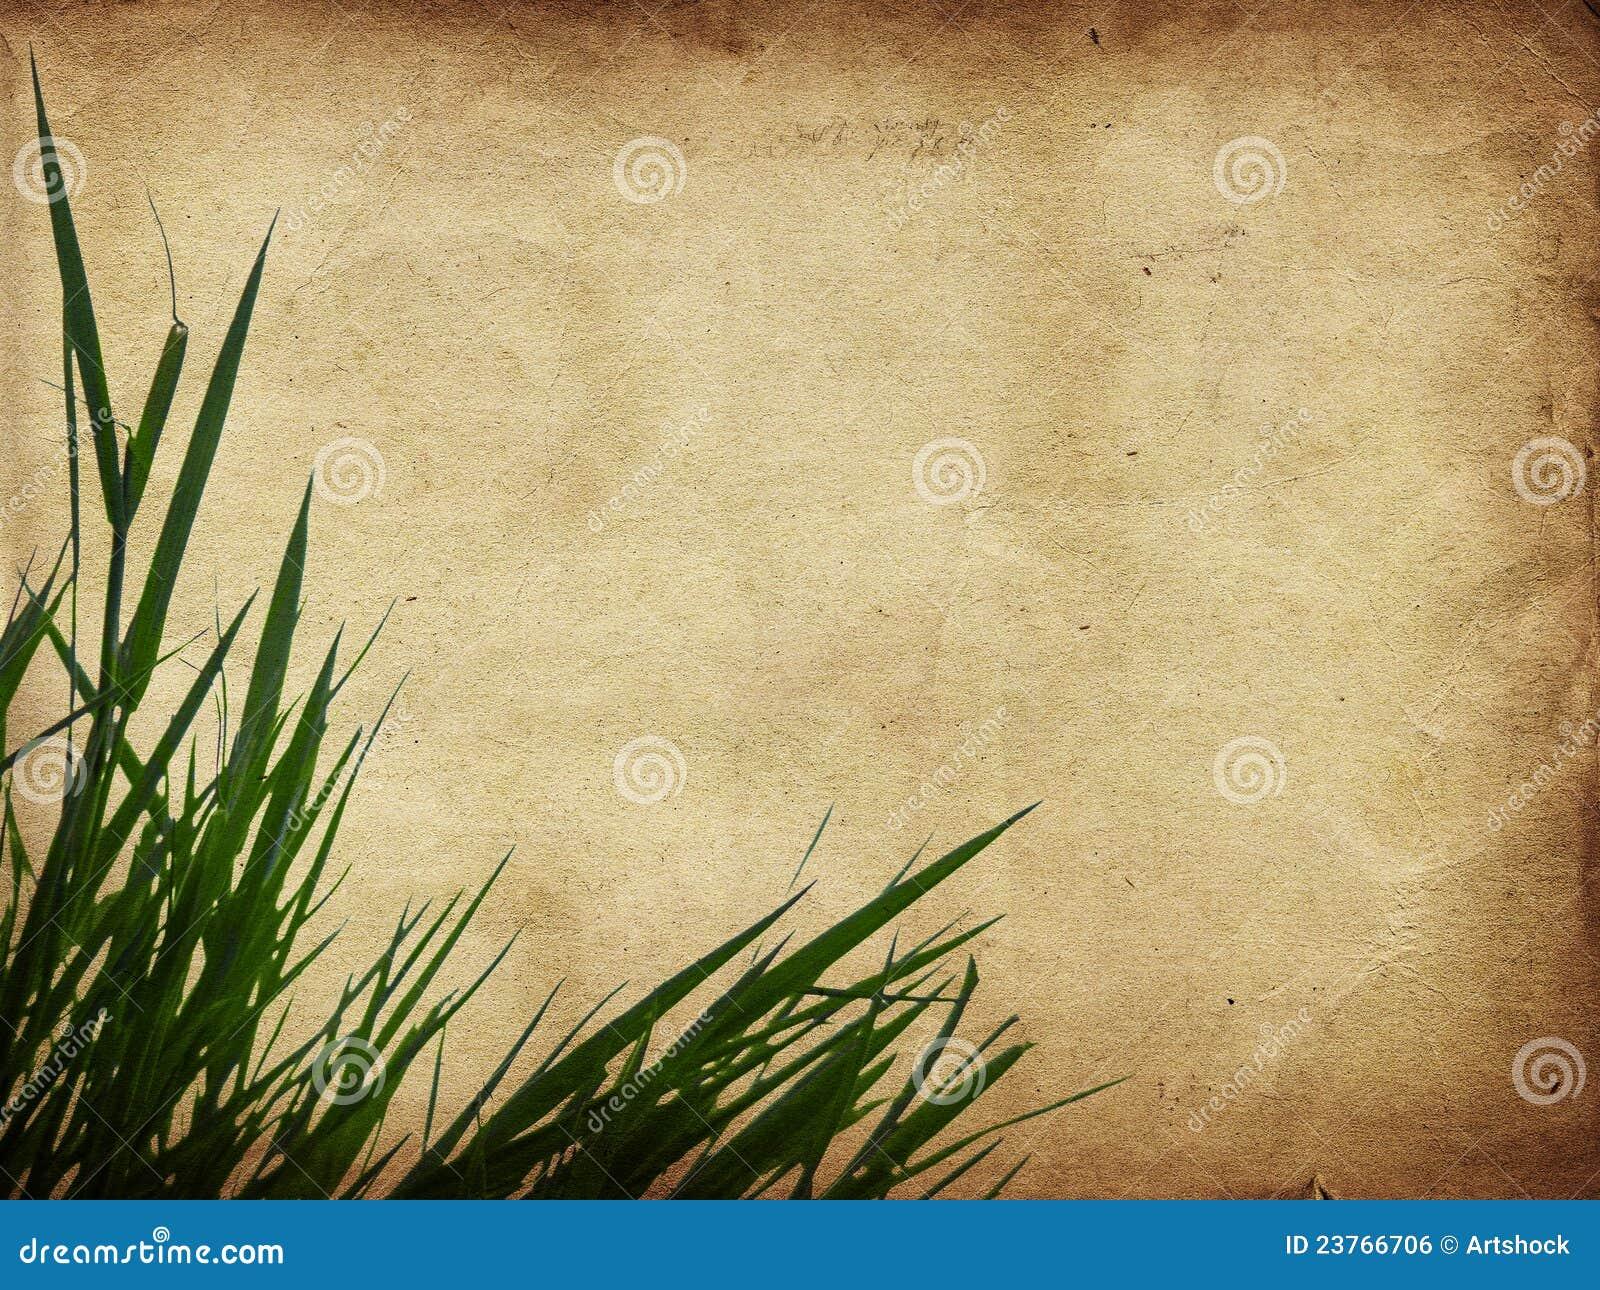 Green grass on paper